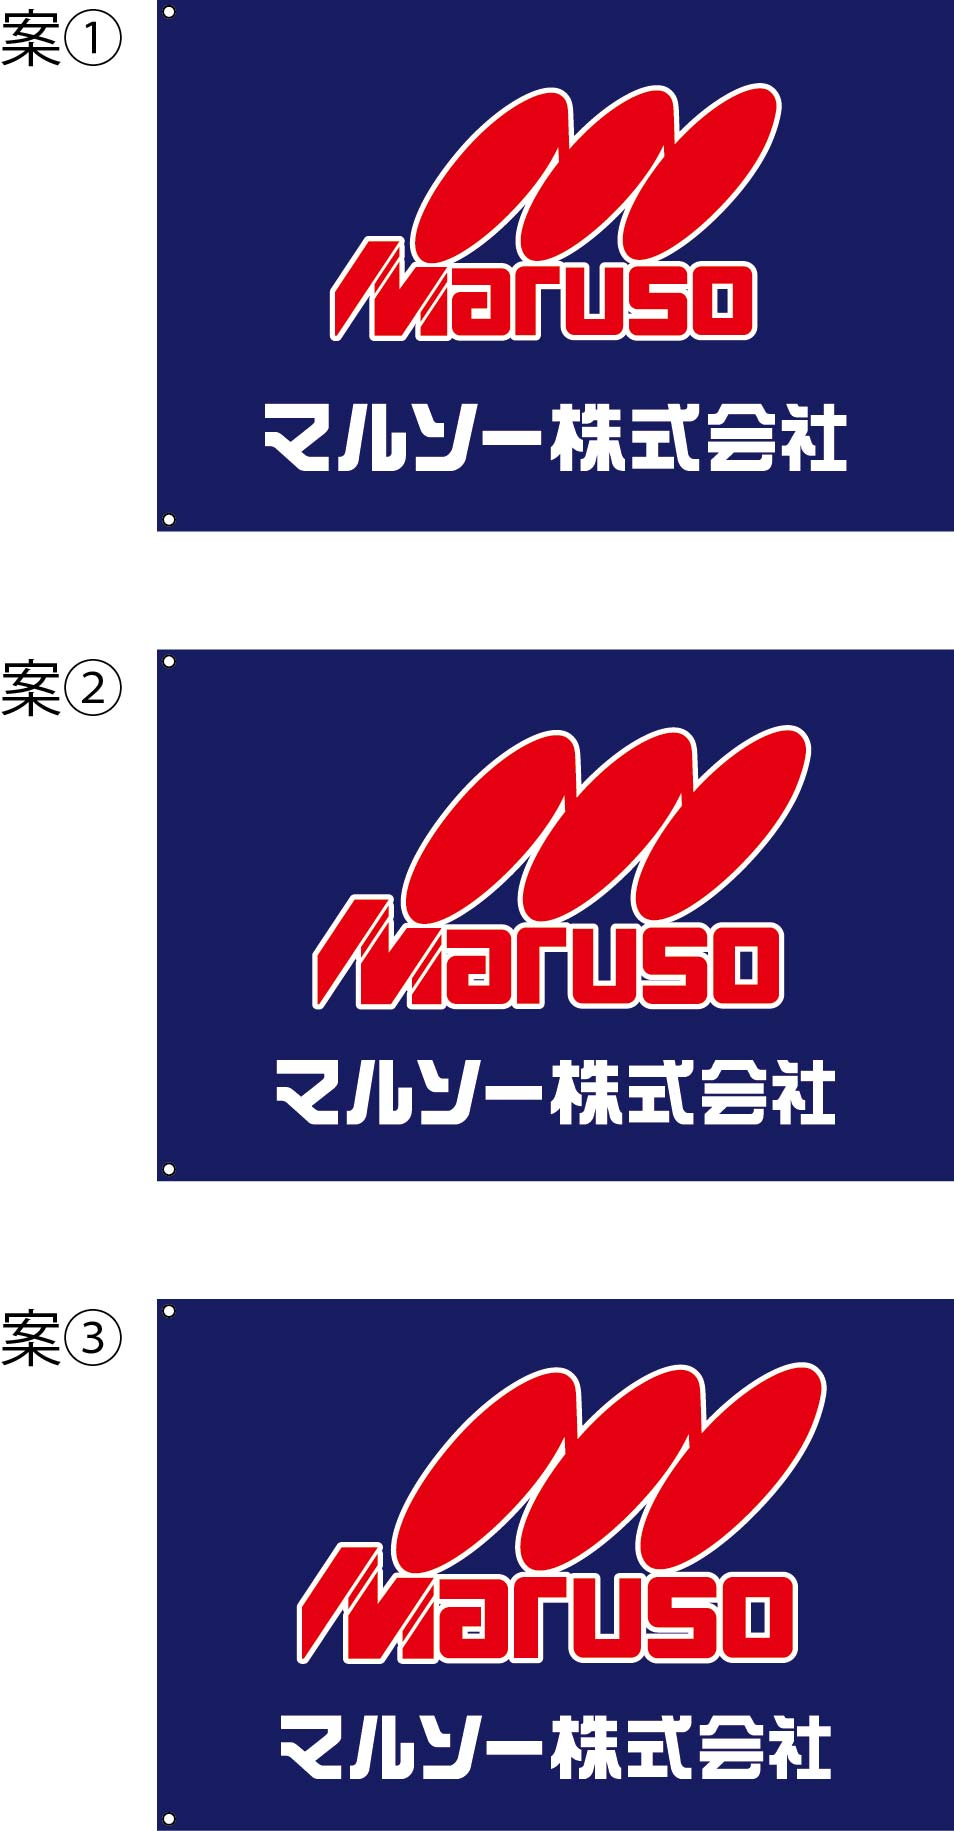 MARUSO 旗